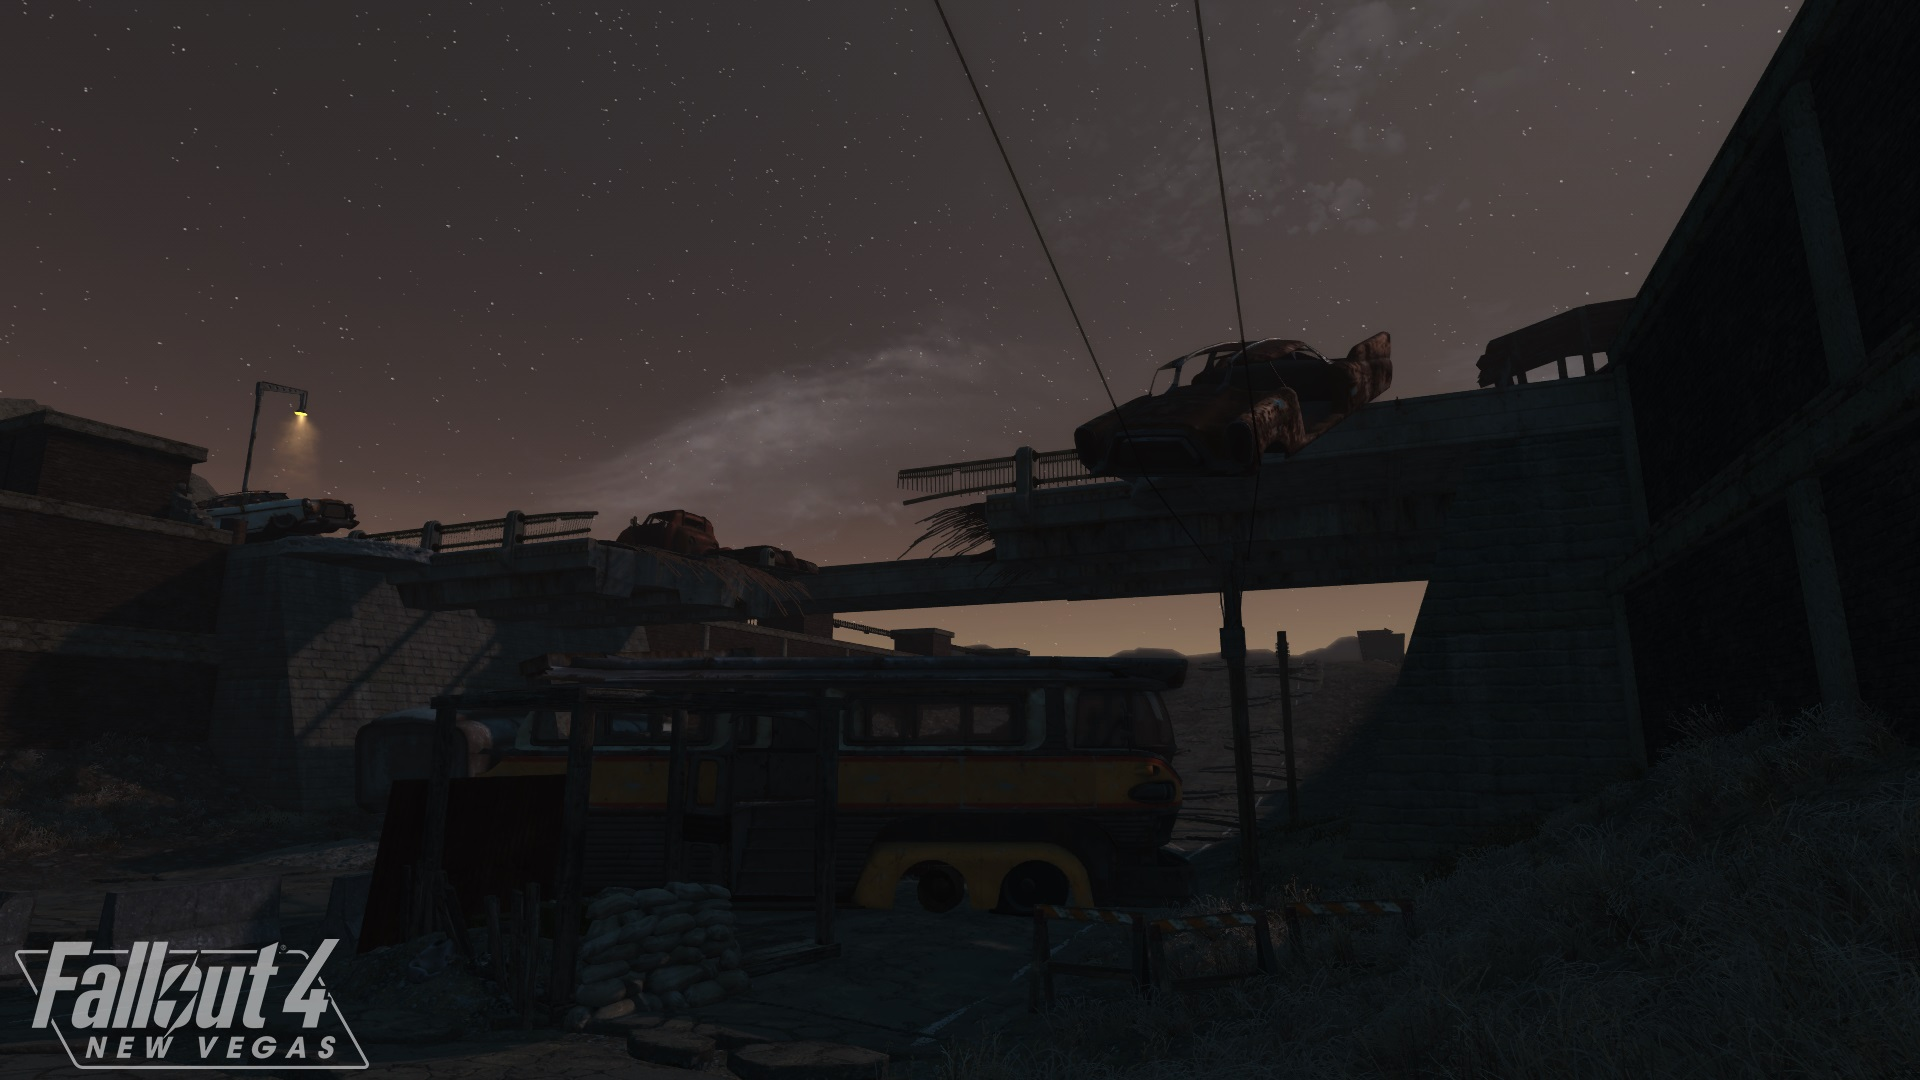 Fallout 4: New Vegas - Fallout 4 Мод